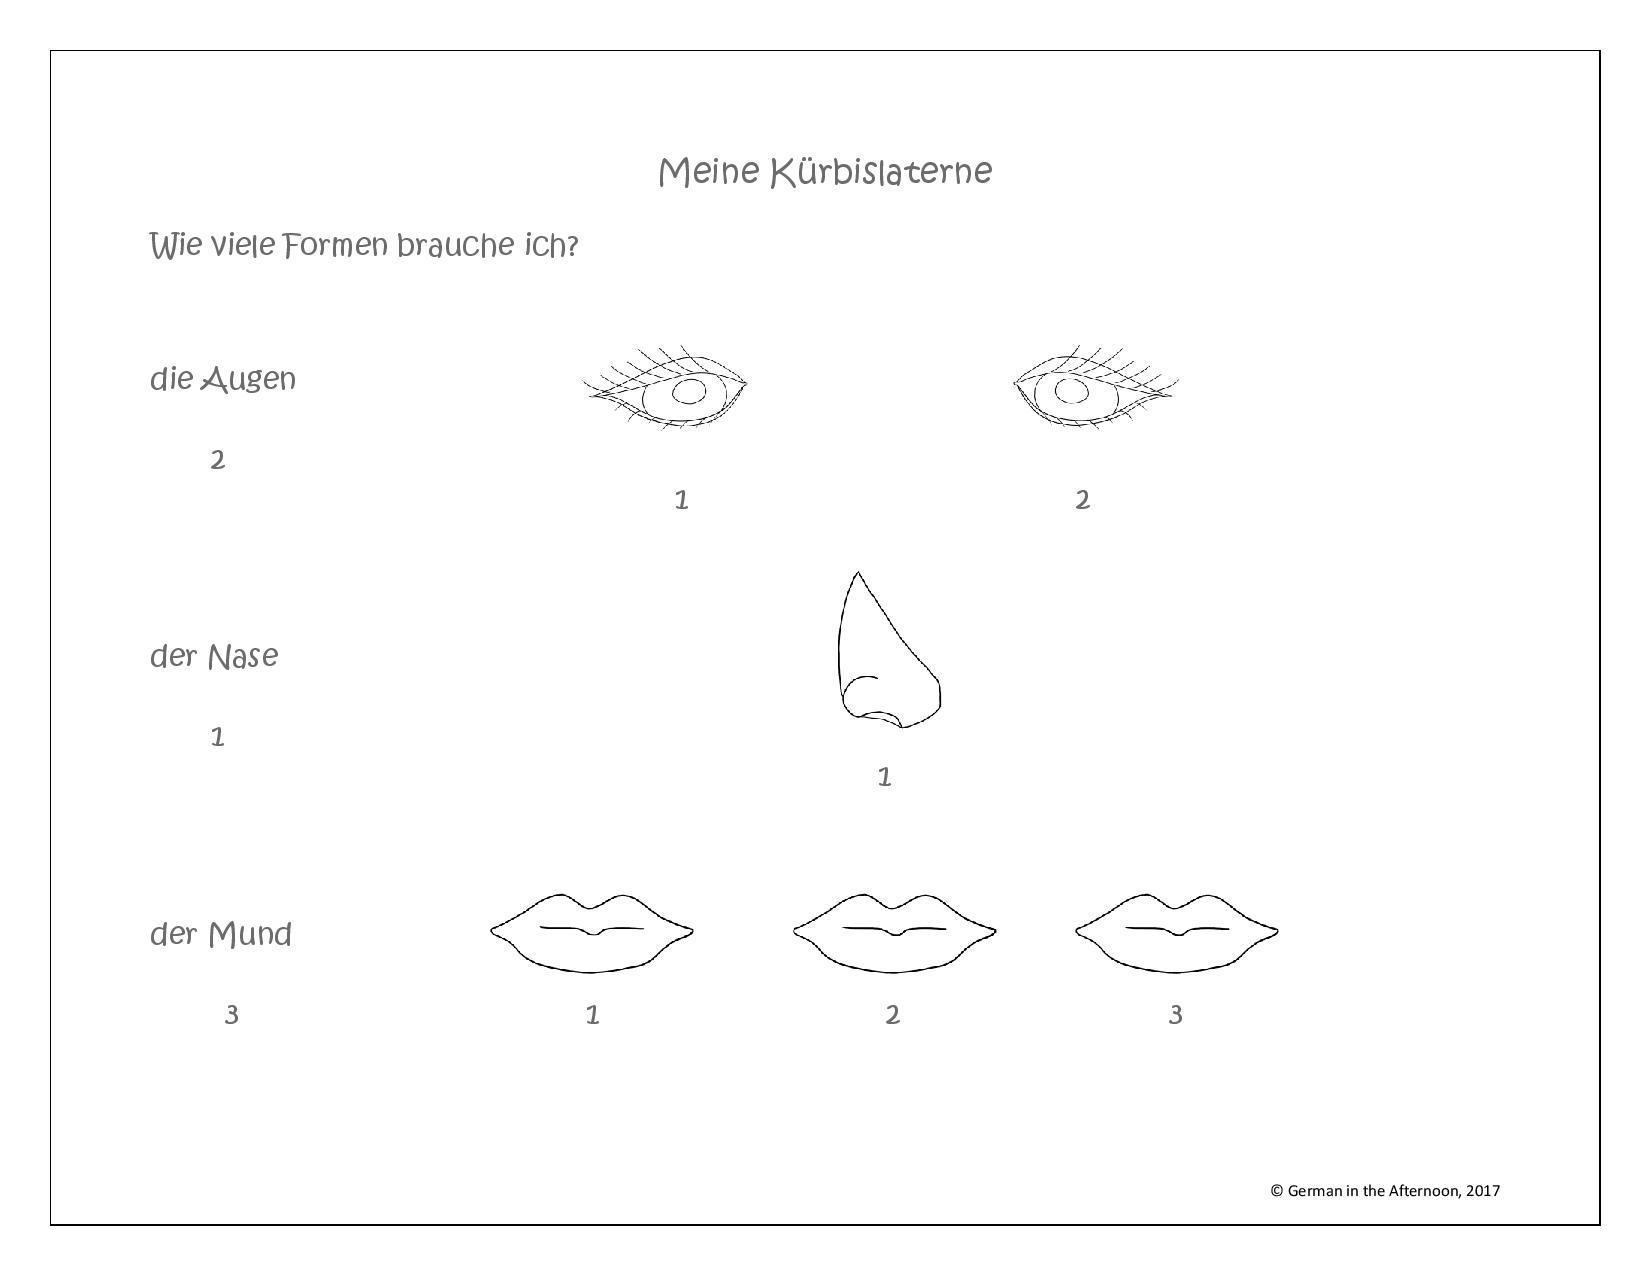 Meine Kürbislaterne mit Formen GitA-page-002